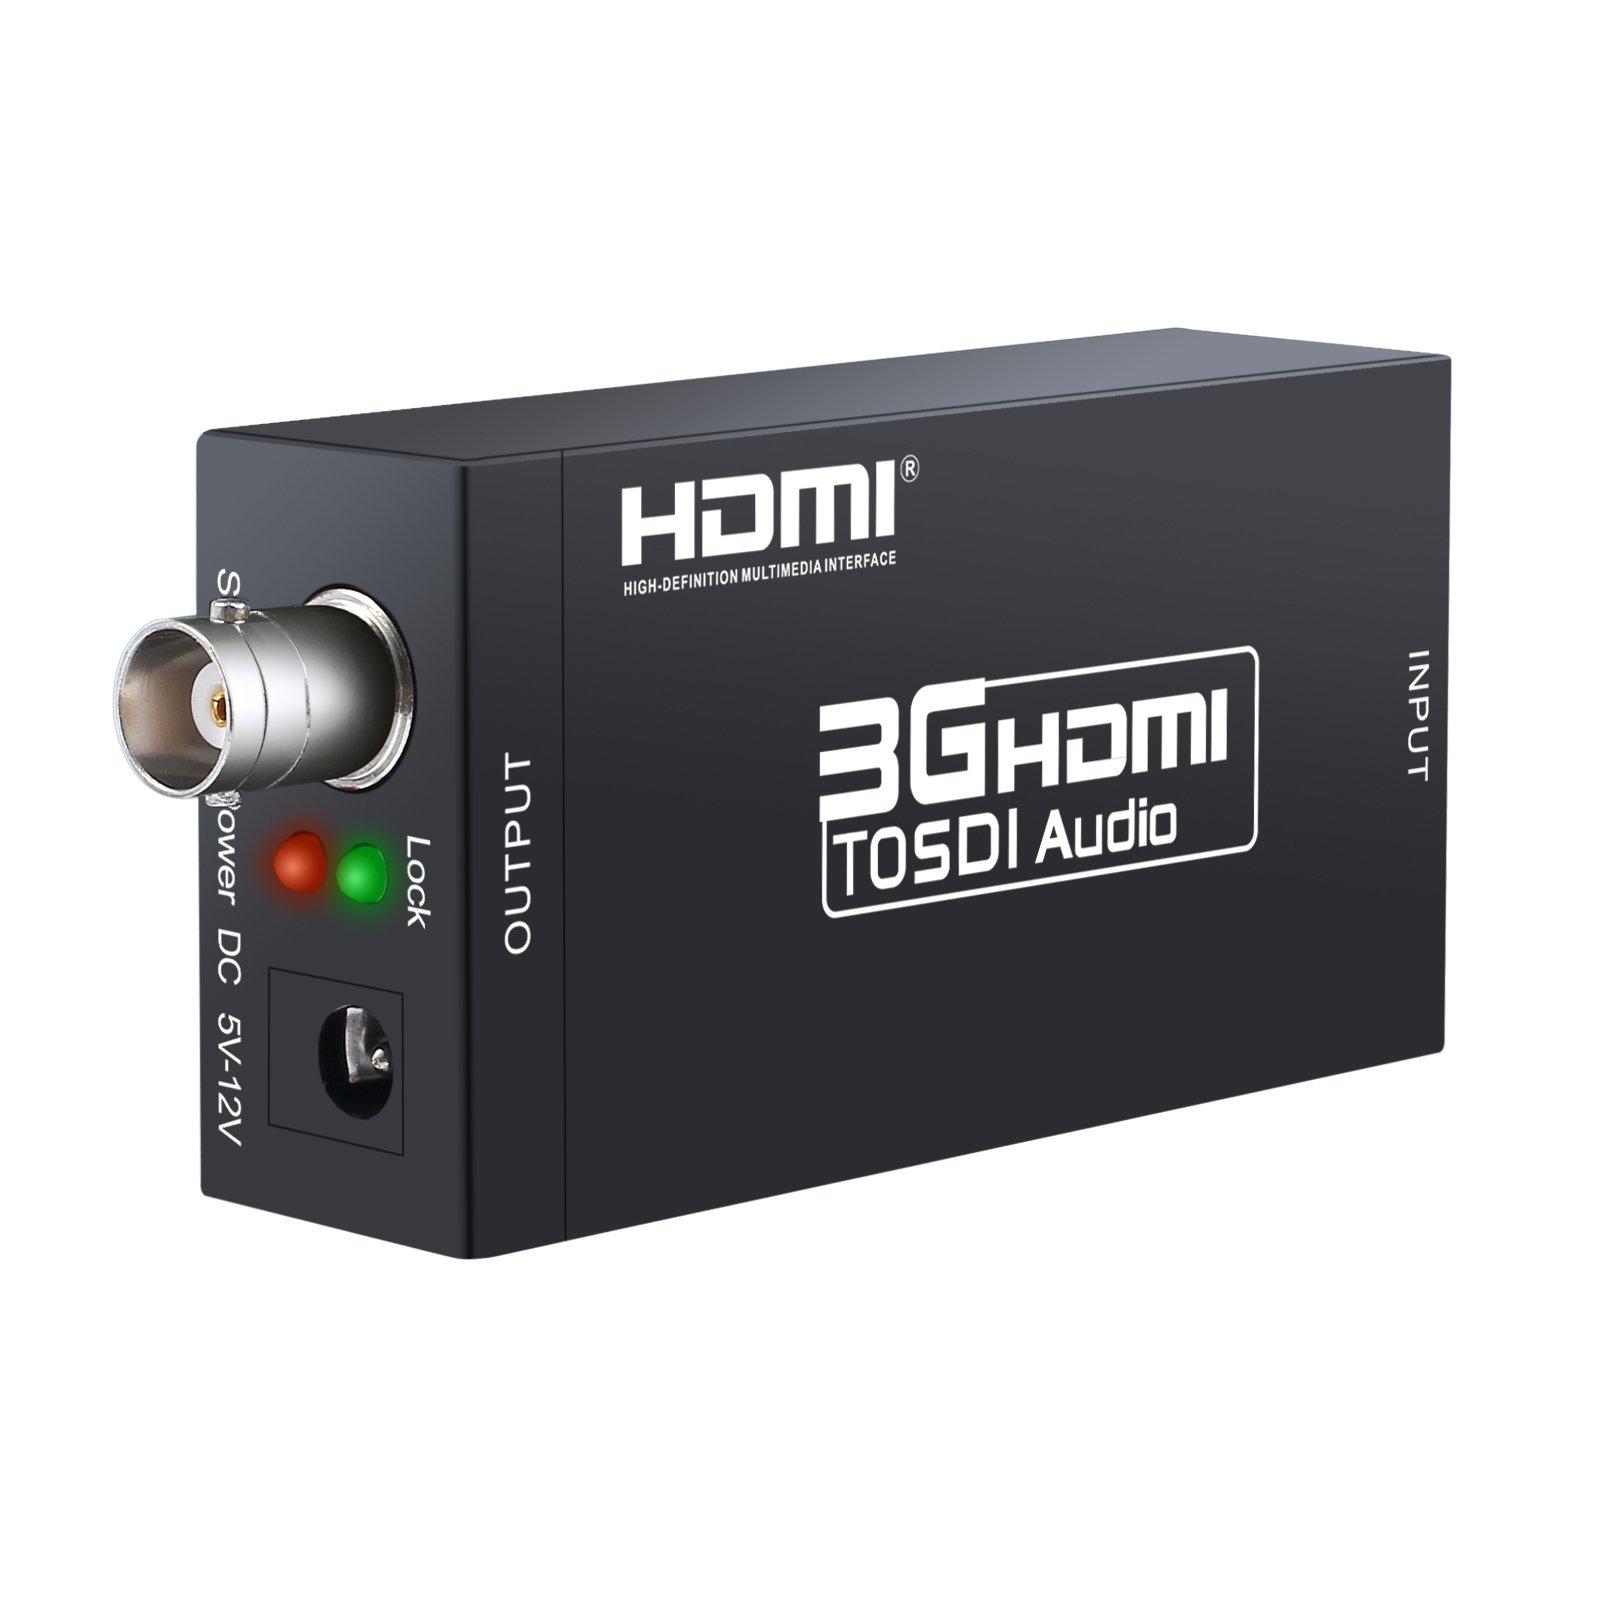 eSynic HDMI to SDI Converter Adapter HDMI SDI Adapter Full HD 1080P Audio Converter Support SDI/HD-SDI/3G-SDI Signals for Camera Home Theater by eSynic